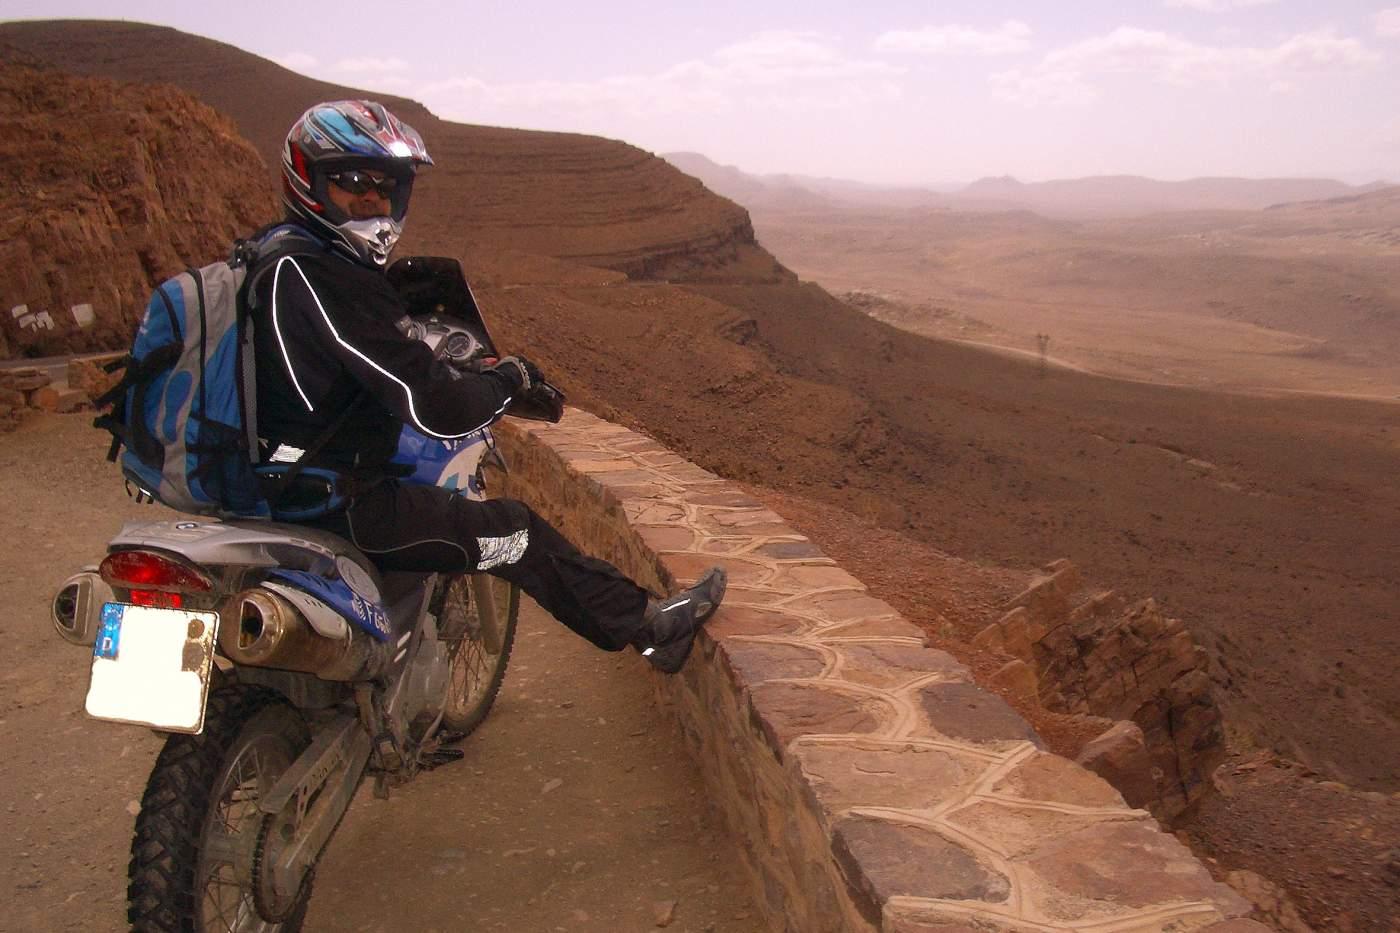 Marokko Motorrad Reise Straßentour